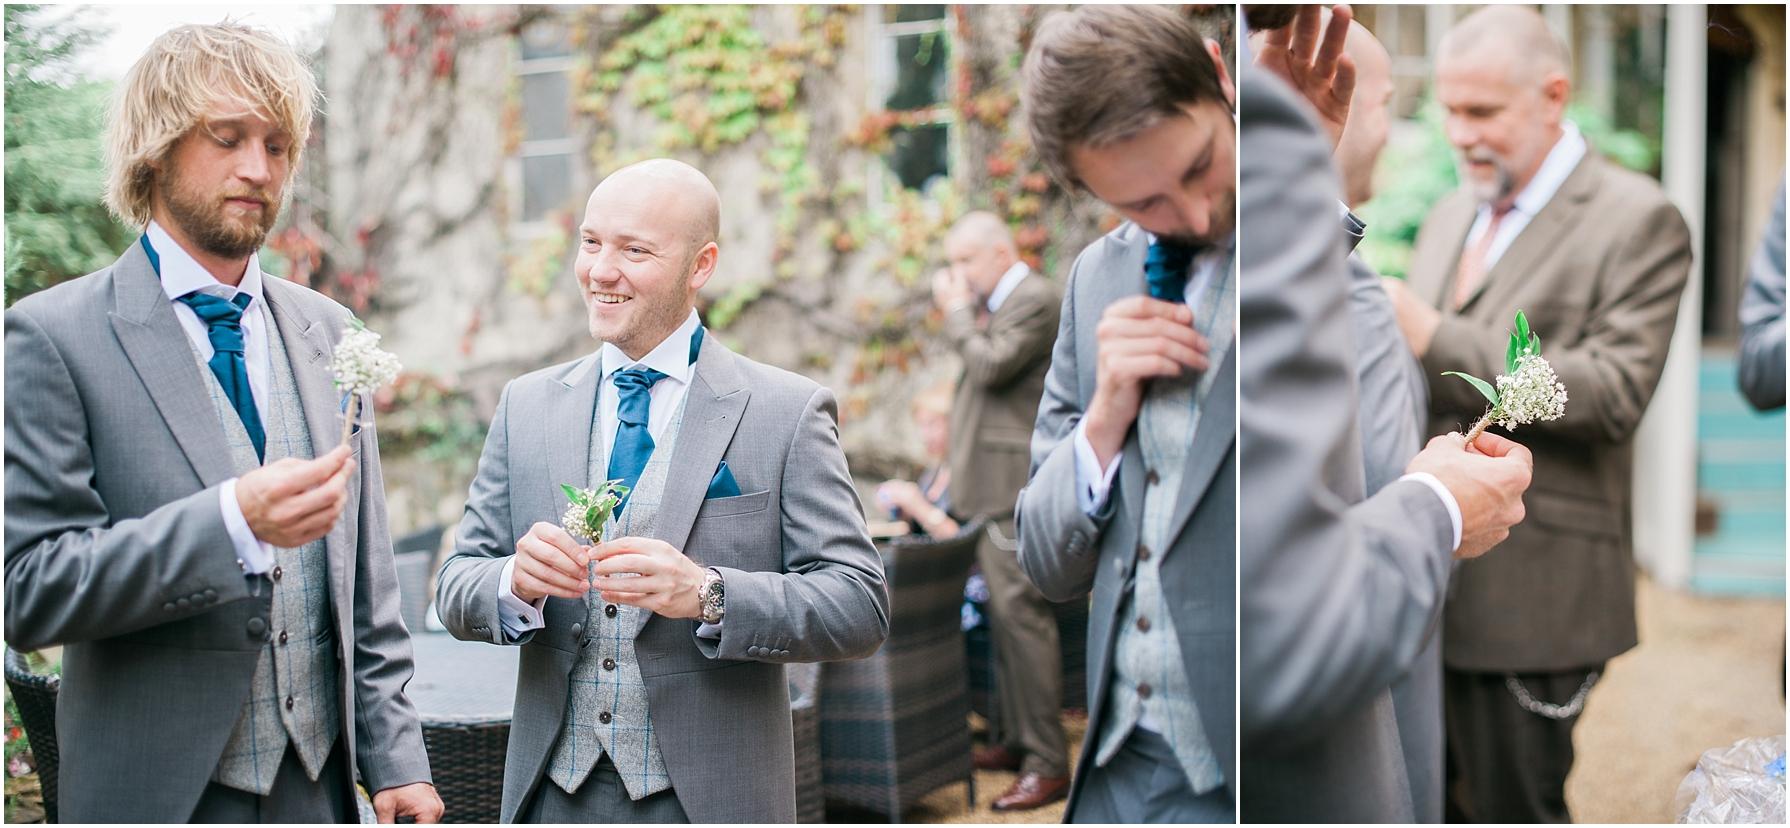 groomsmen putting on button holes